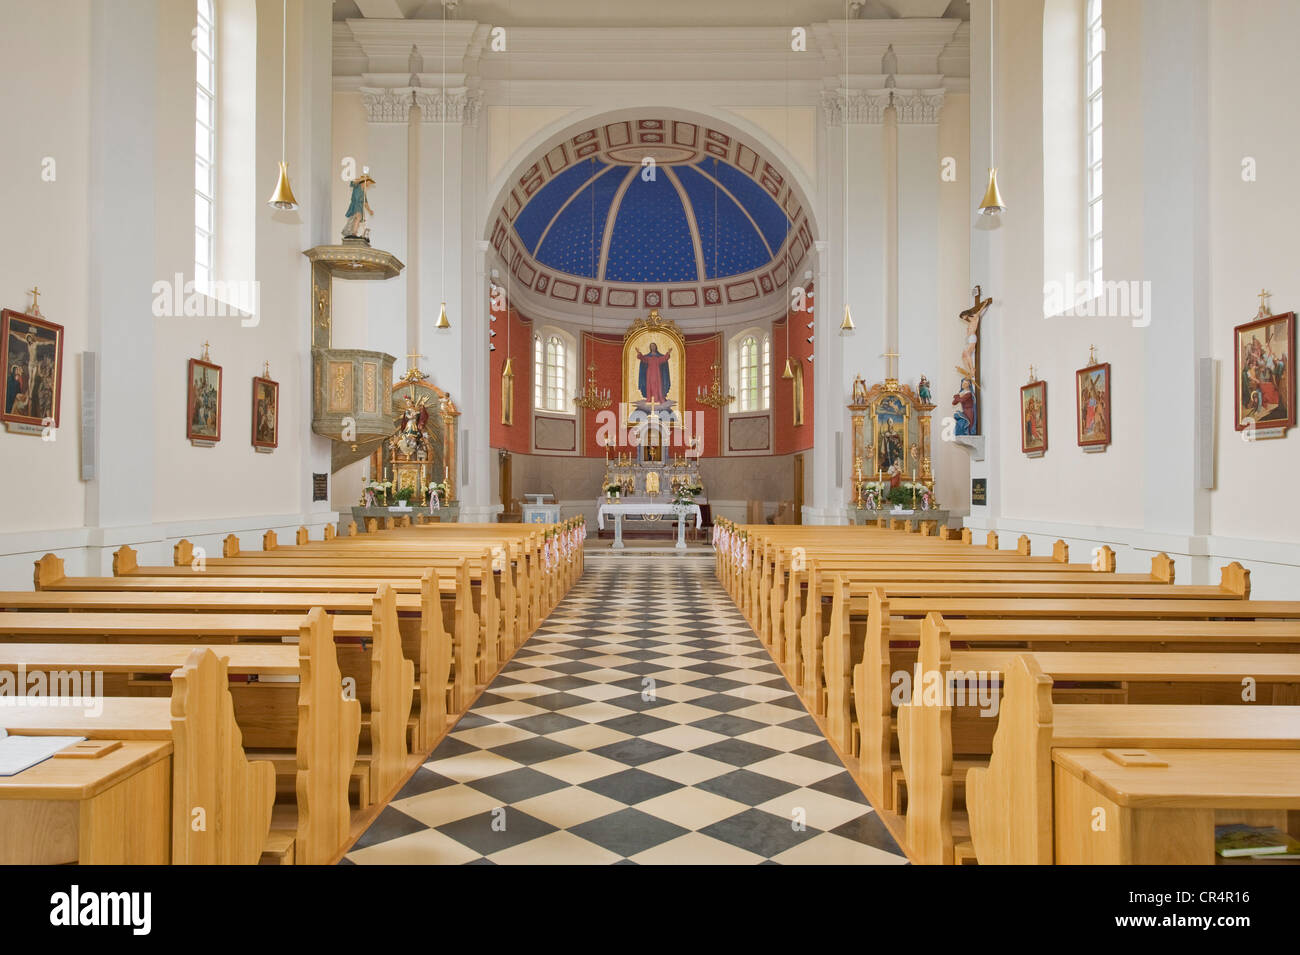 Pilgrimg Church of Our Lady of the Snows, Kaltenberg, Bucklige Welt, Lower Austria, Austria, Europe - Stock Image